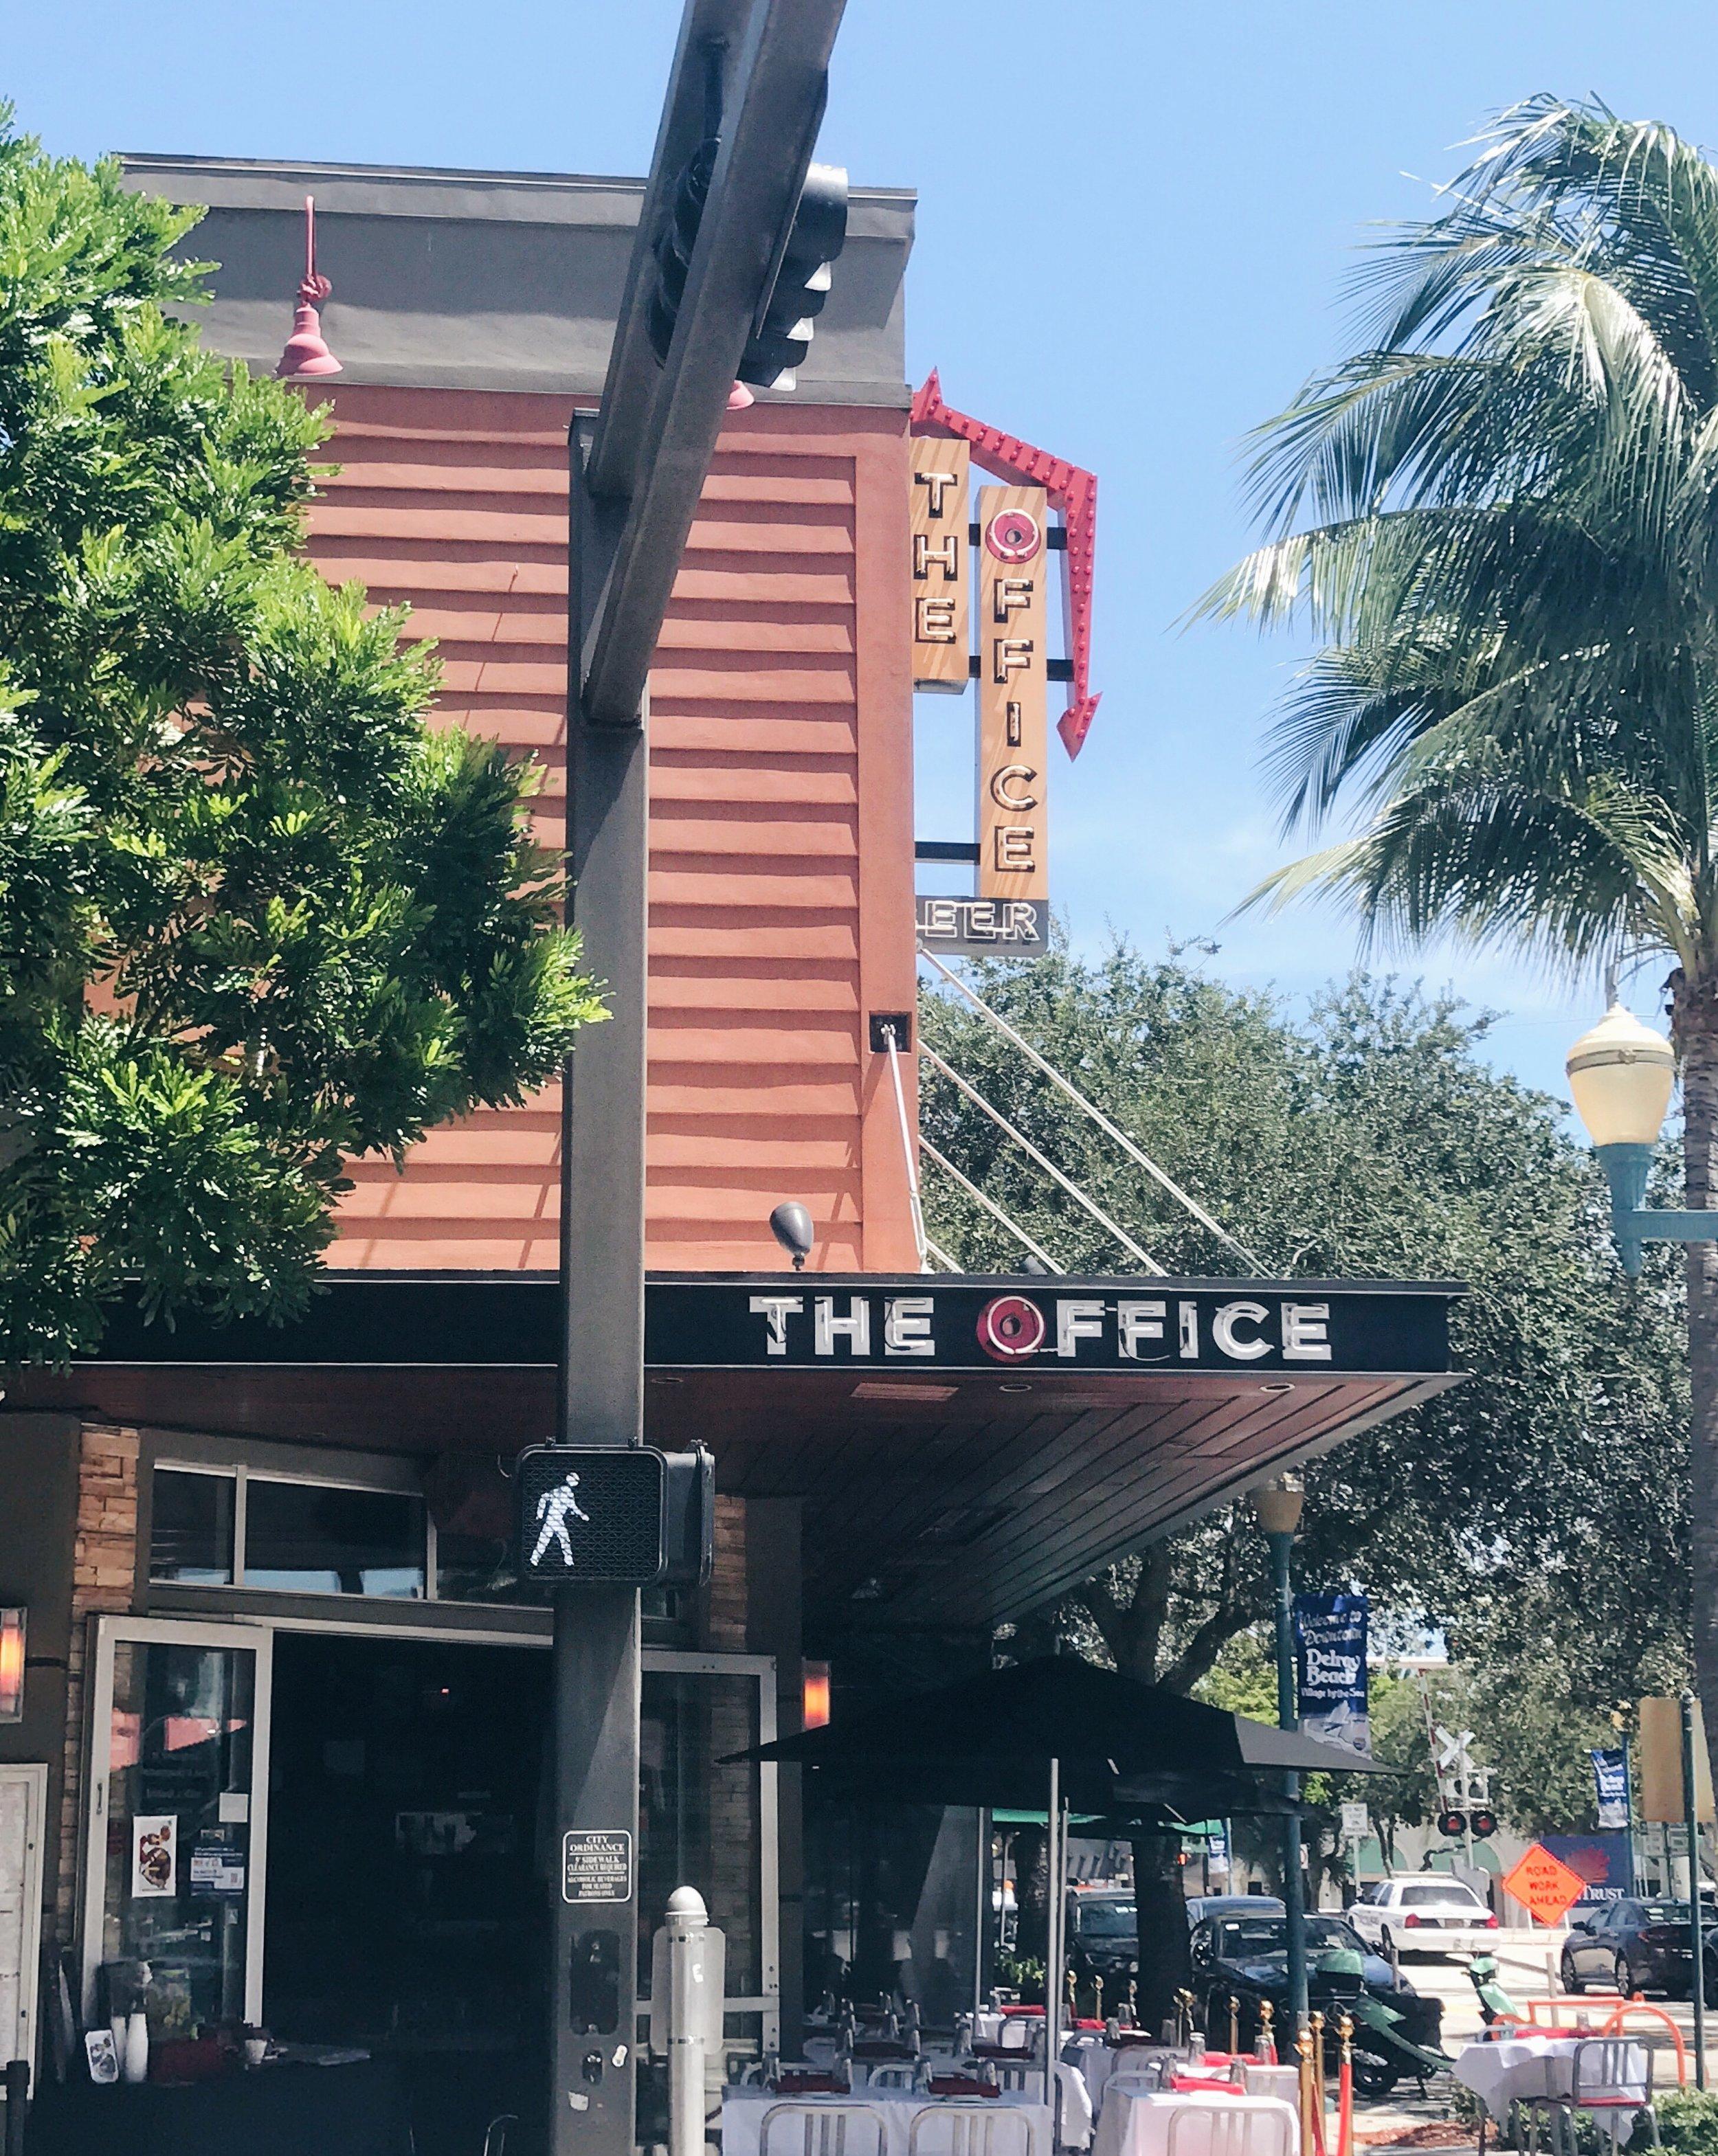 The Office ~ 201 East Atlantic Avenue, Delray Beach, FL 33444